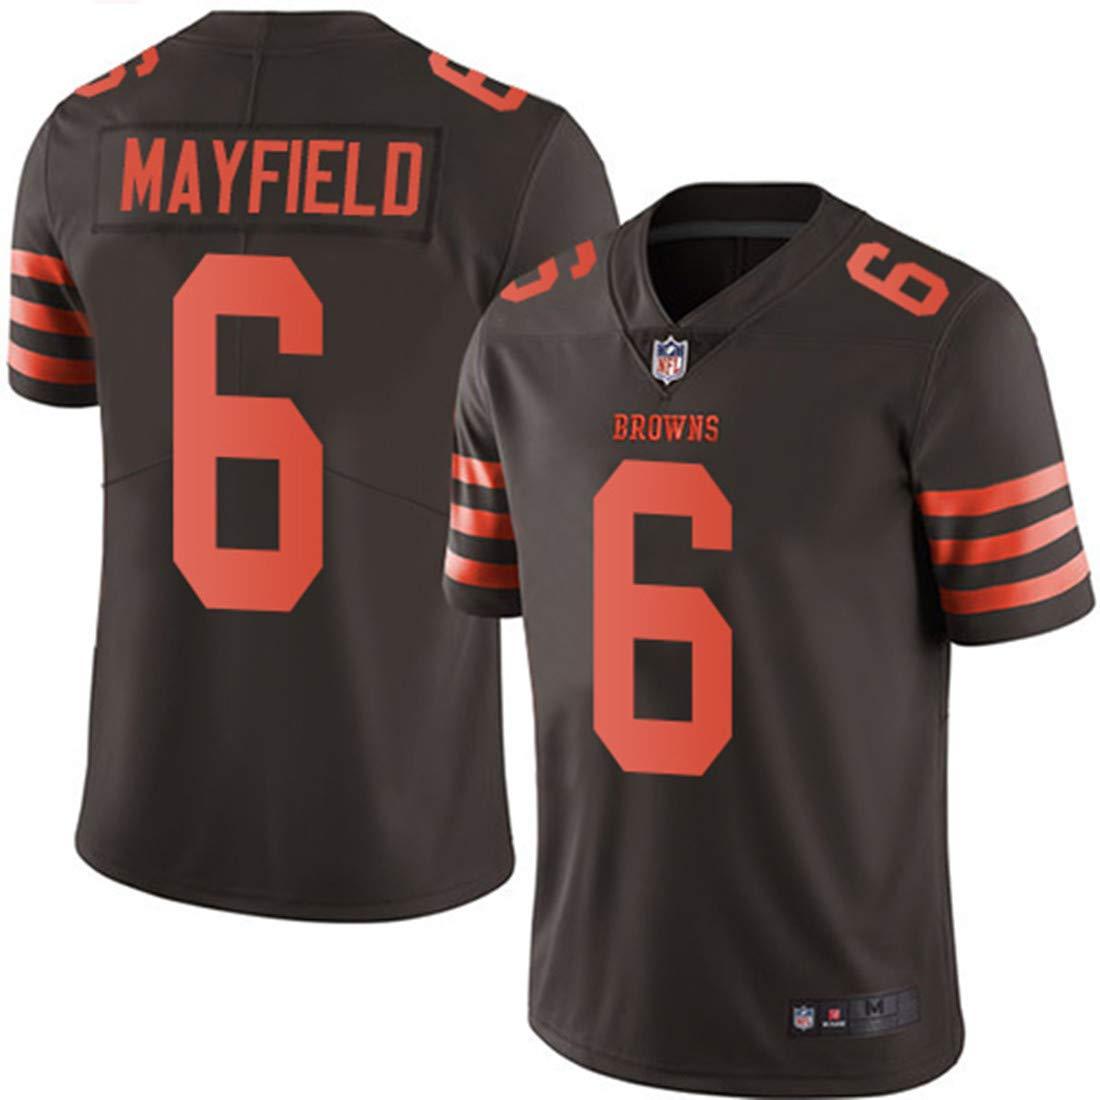 Cleveland Browns #6 Baker Mayfield Jersey Orange Large Baseball & Softball Sporting Goods